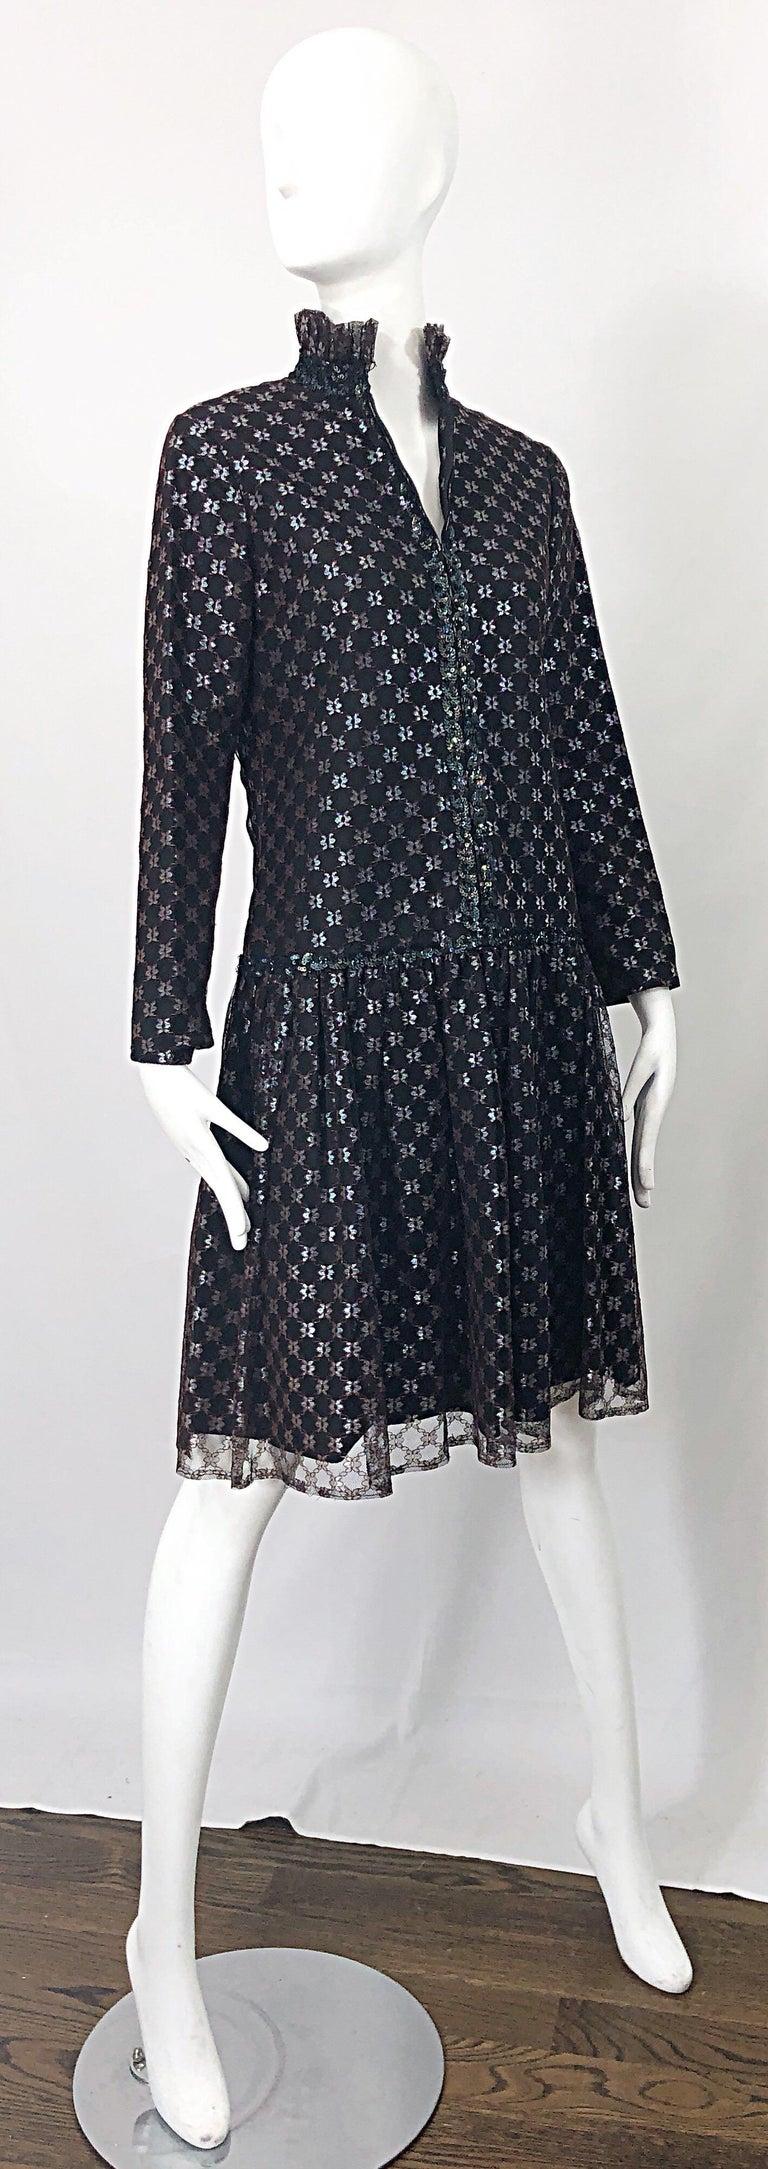 Oscar de la Renta 1970s Black + Burgundy Red Iridescent Sequin Drop Waist Dress For Sale 5